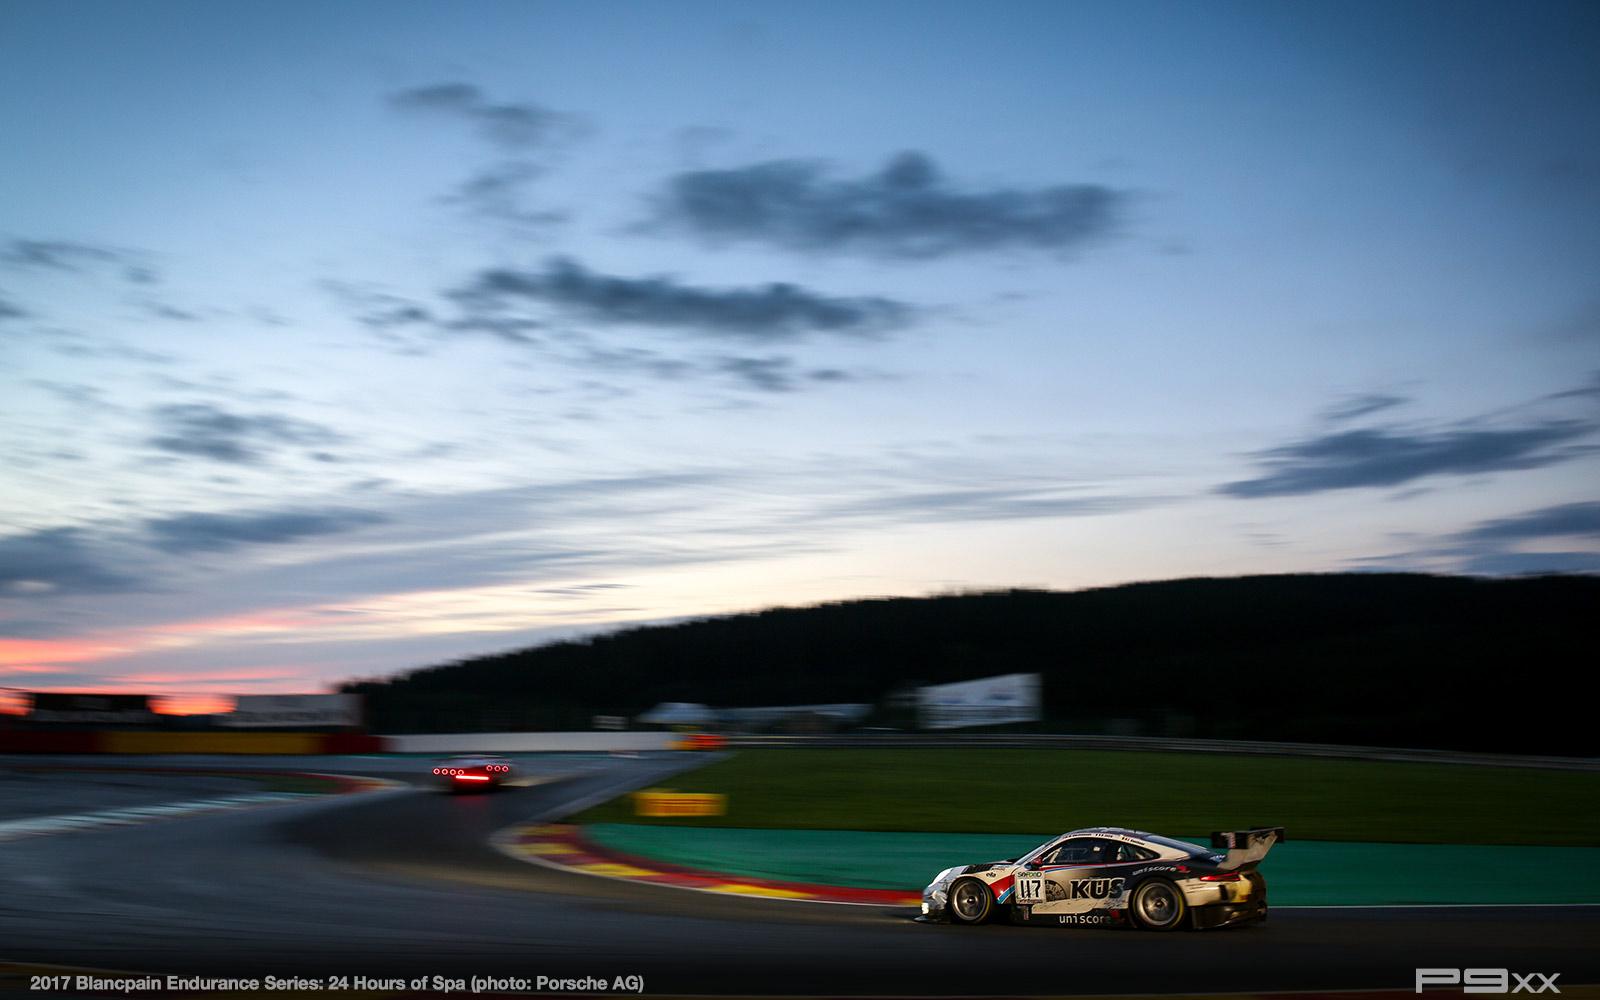 2017-24-Hours-of-Spa-Porsche-367